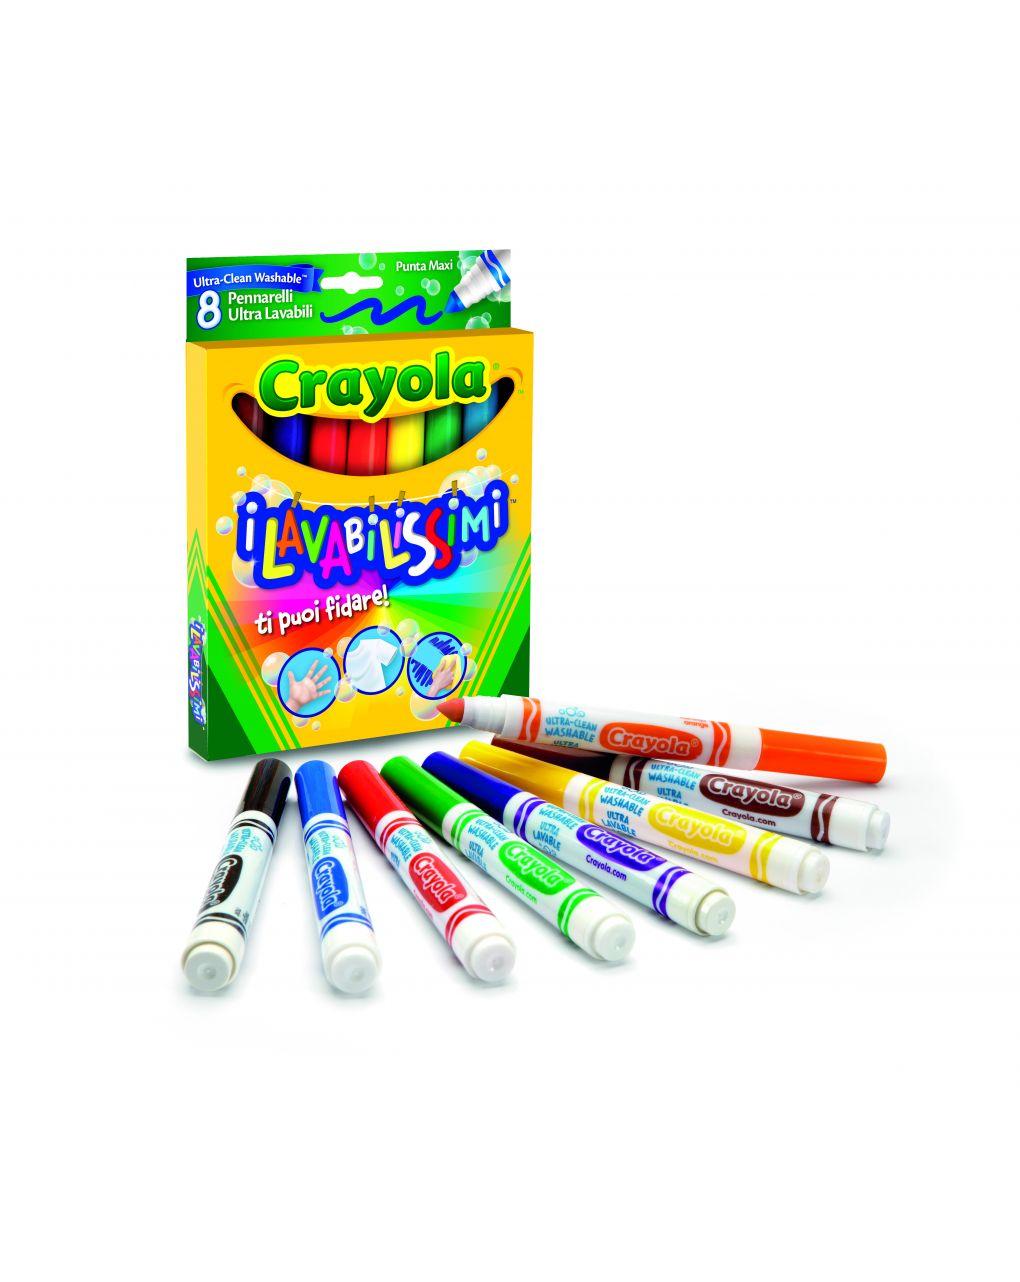 Crayola - 8 pennarelli p.maxi ultra lavabili - Crayola